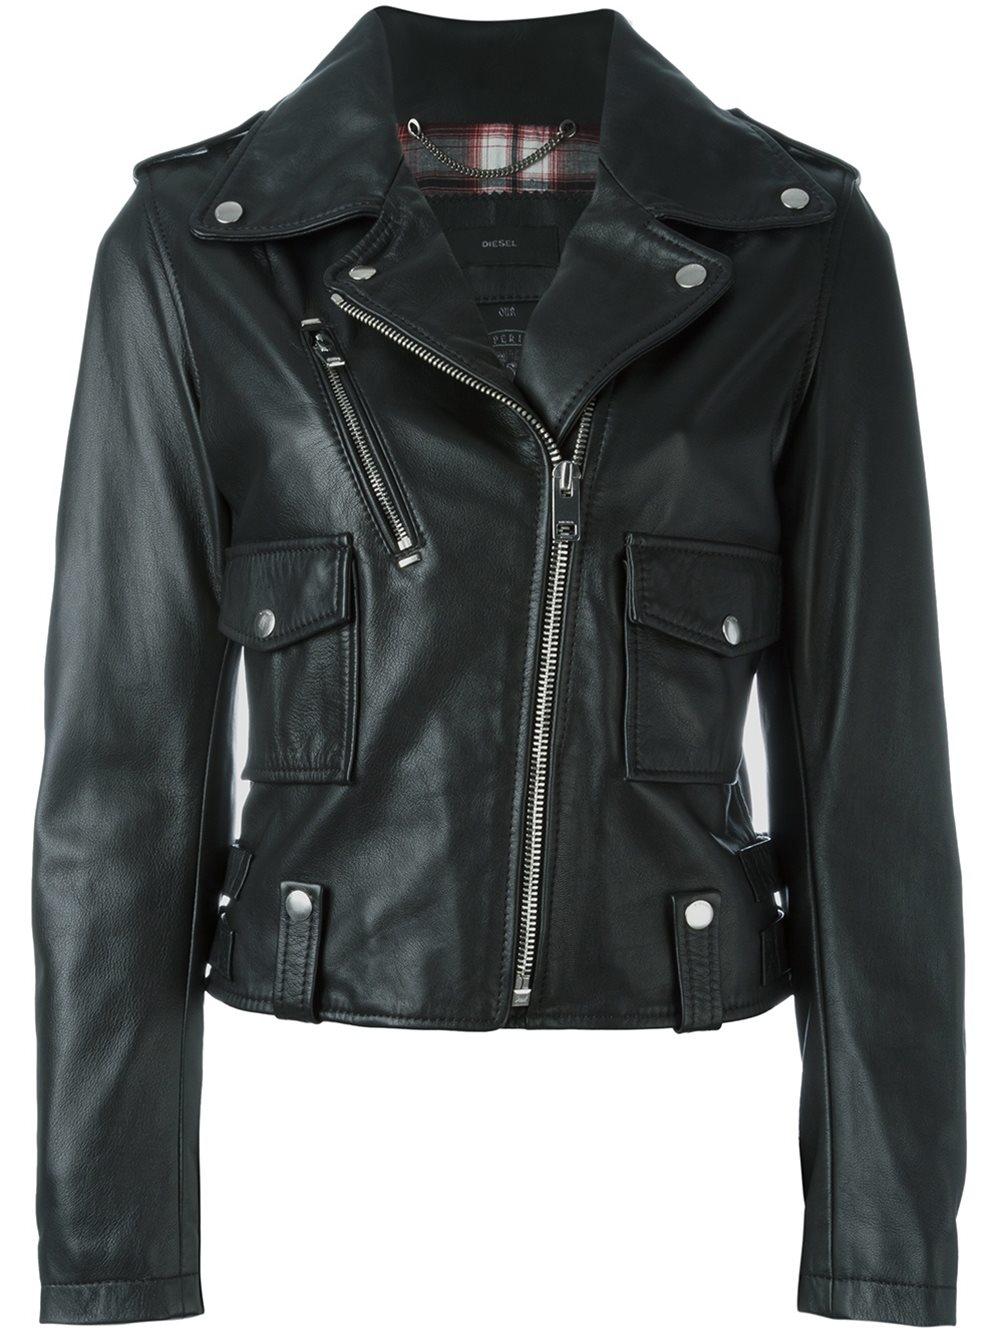 Cheap leather jackets uk